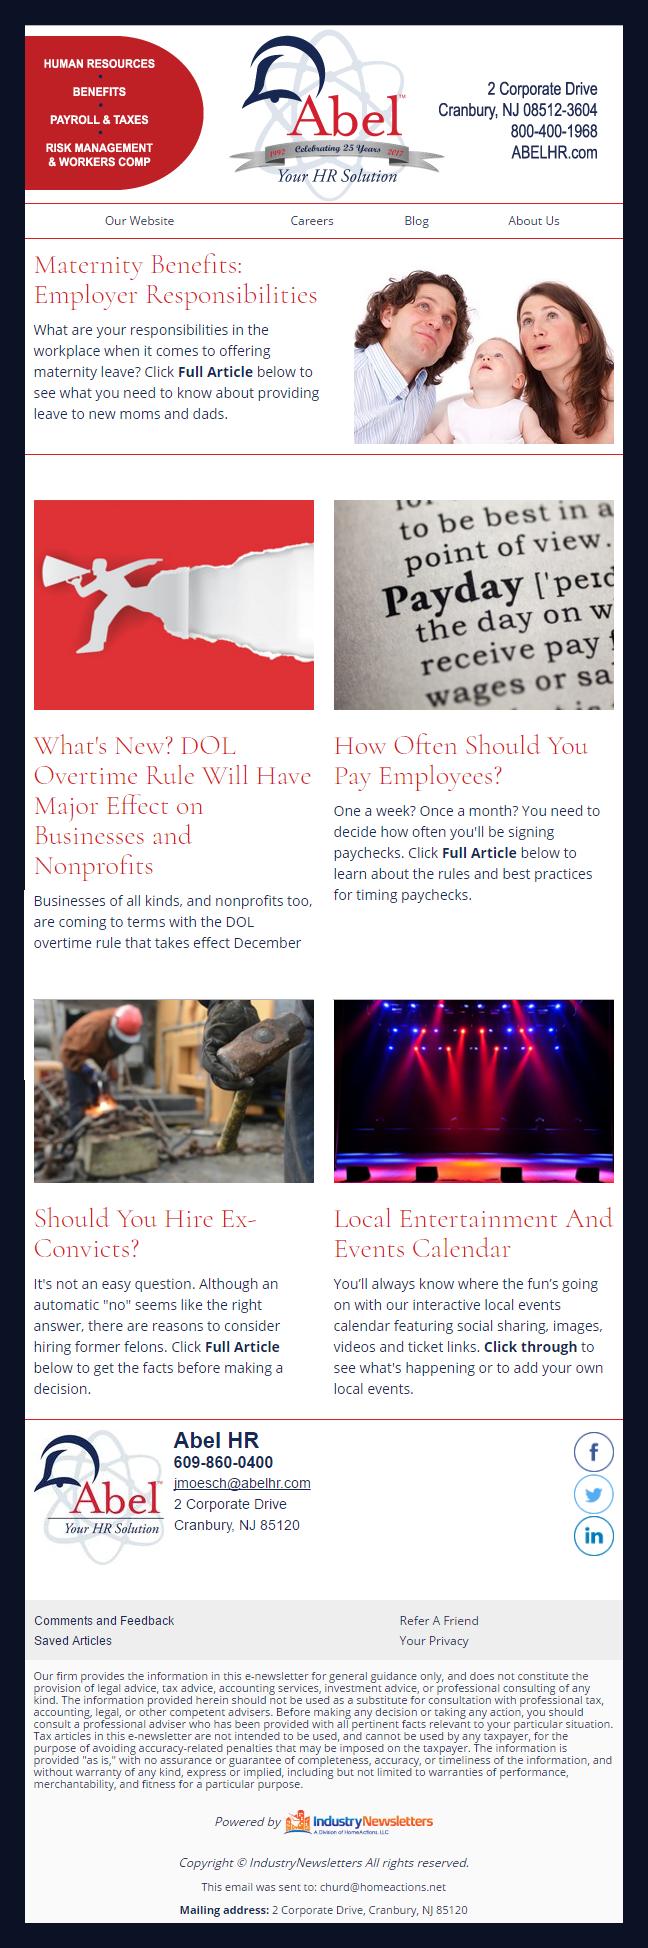 Abel HR Services - IndustryNewsletters Sample Email Newsletter